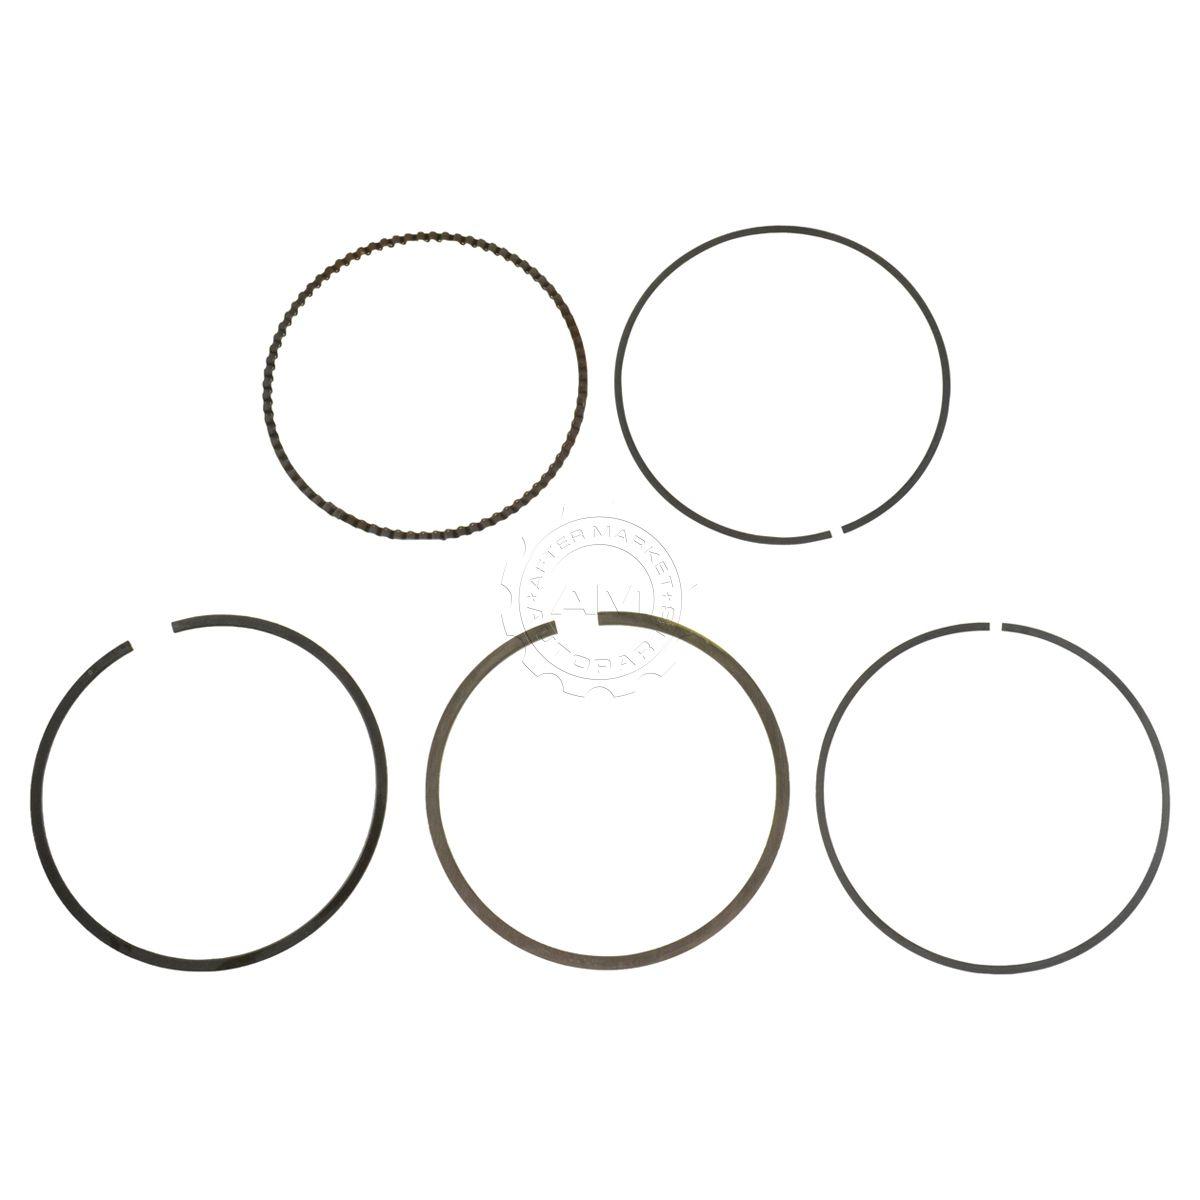 Oem Engine Piston Ring Kit Set 4 6 Cylinder Standard Size